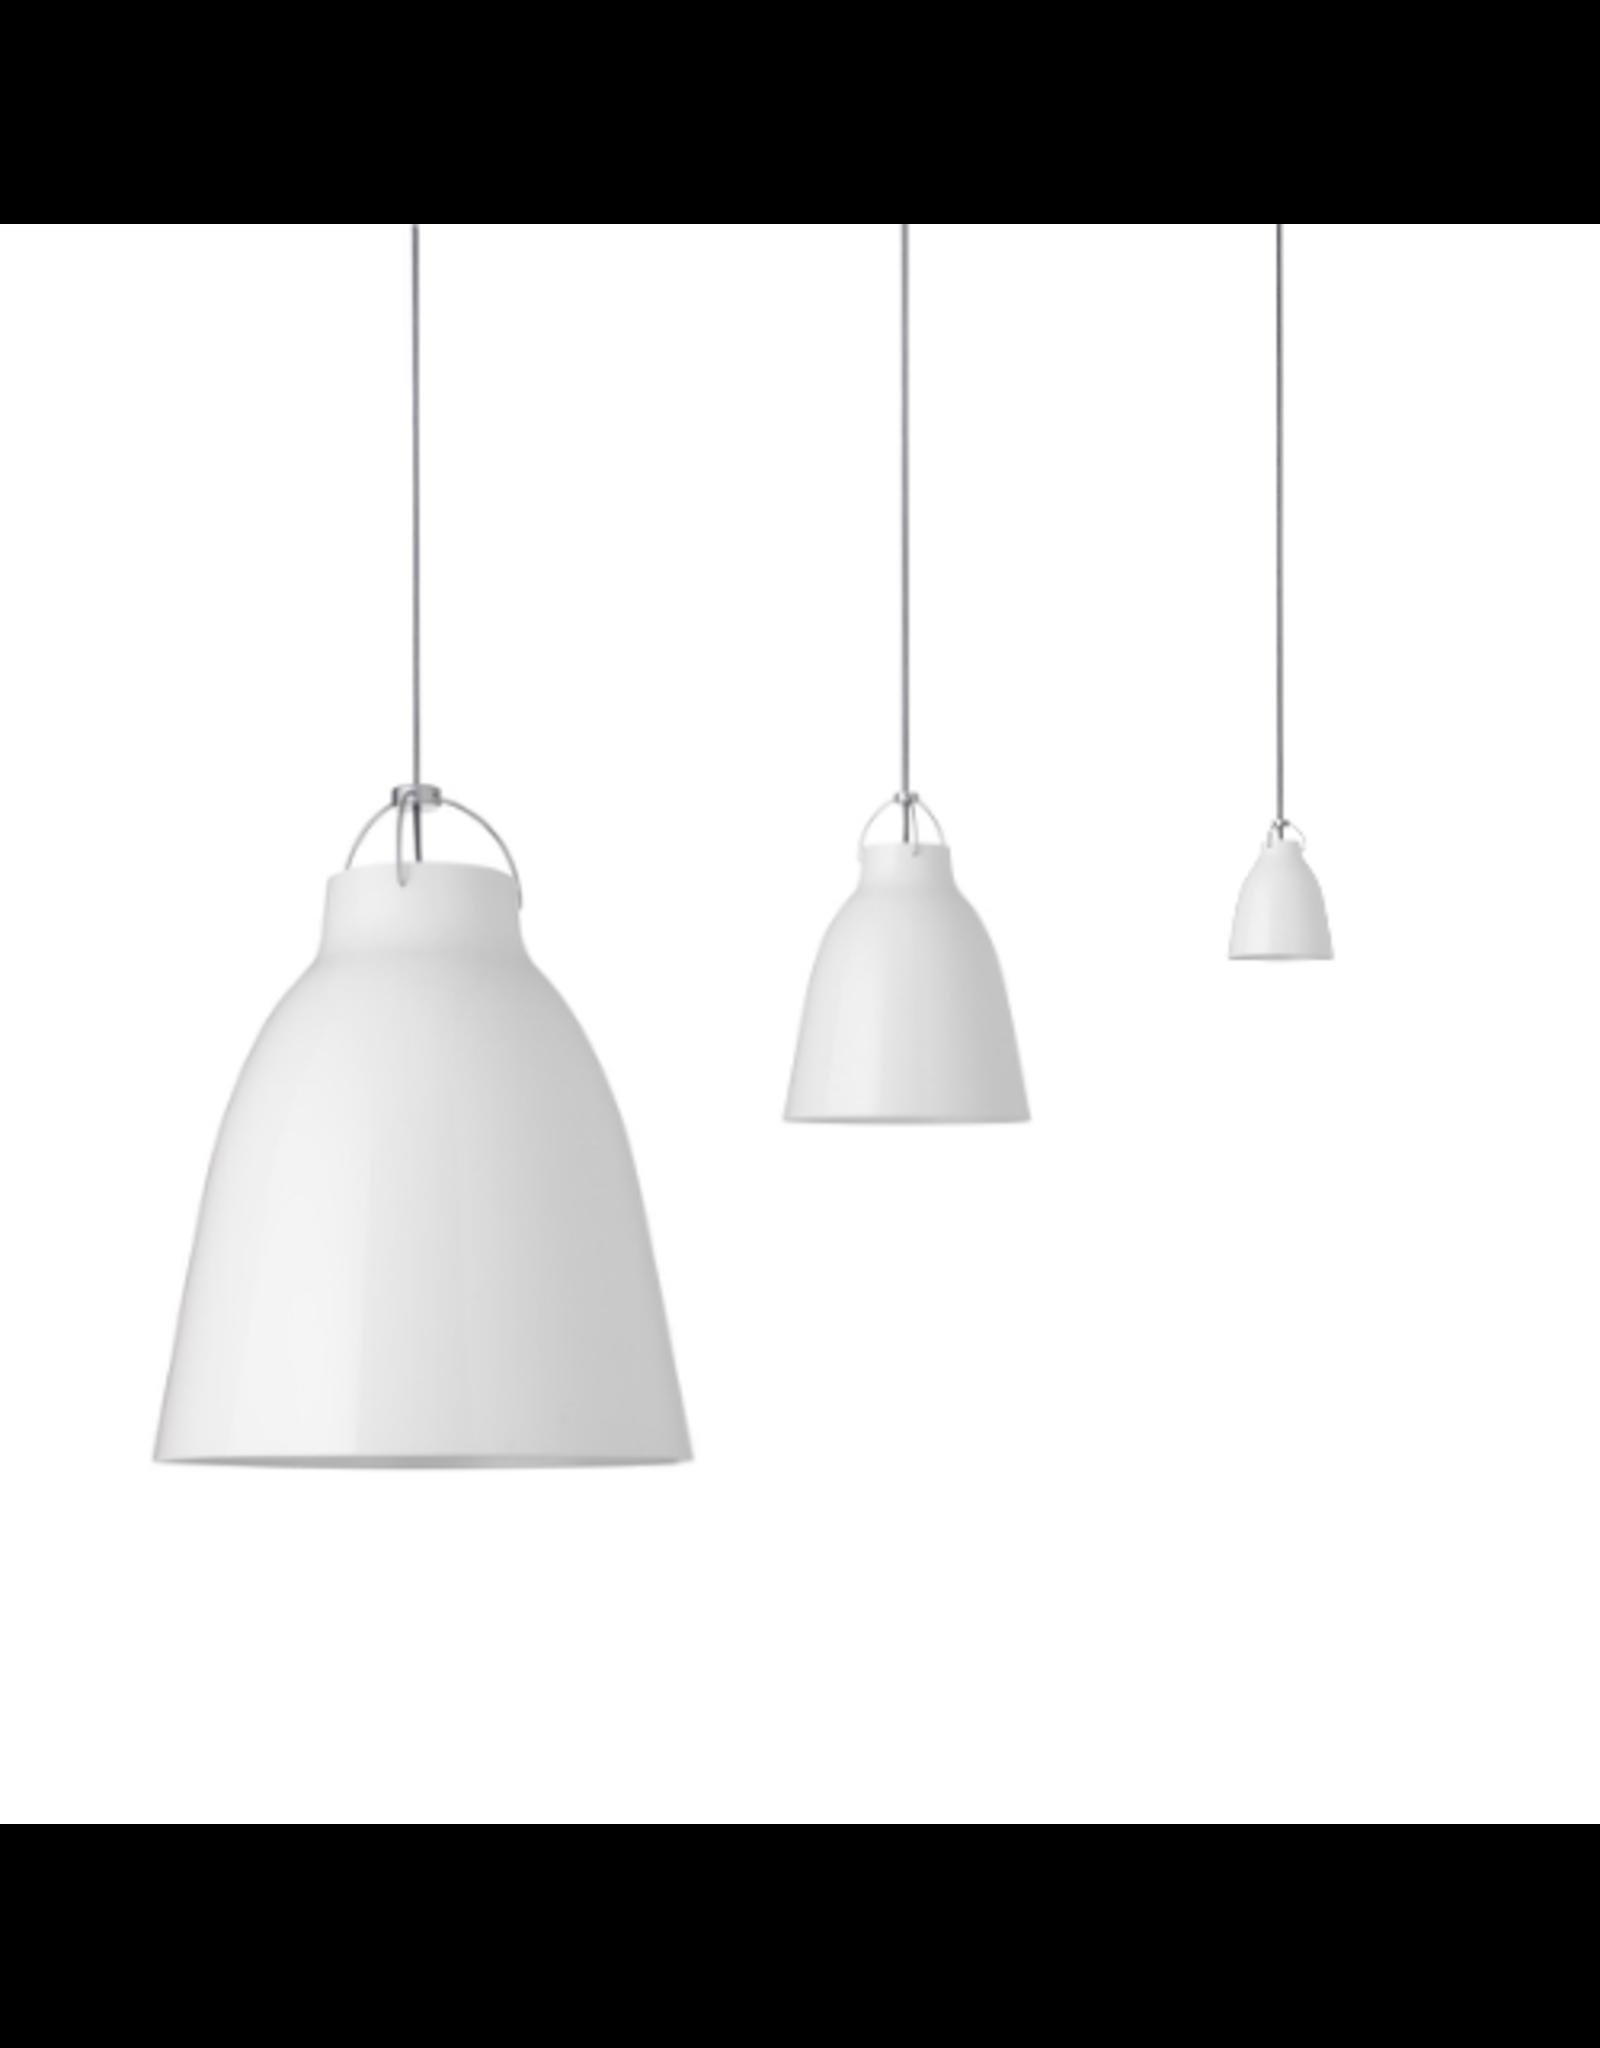 CARAVAGGIO STEEL PENDANT LIGHT IN WHITE HIGH GLOSS LACQUER